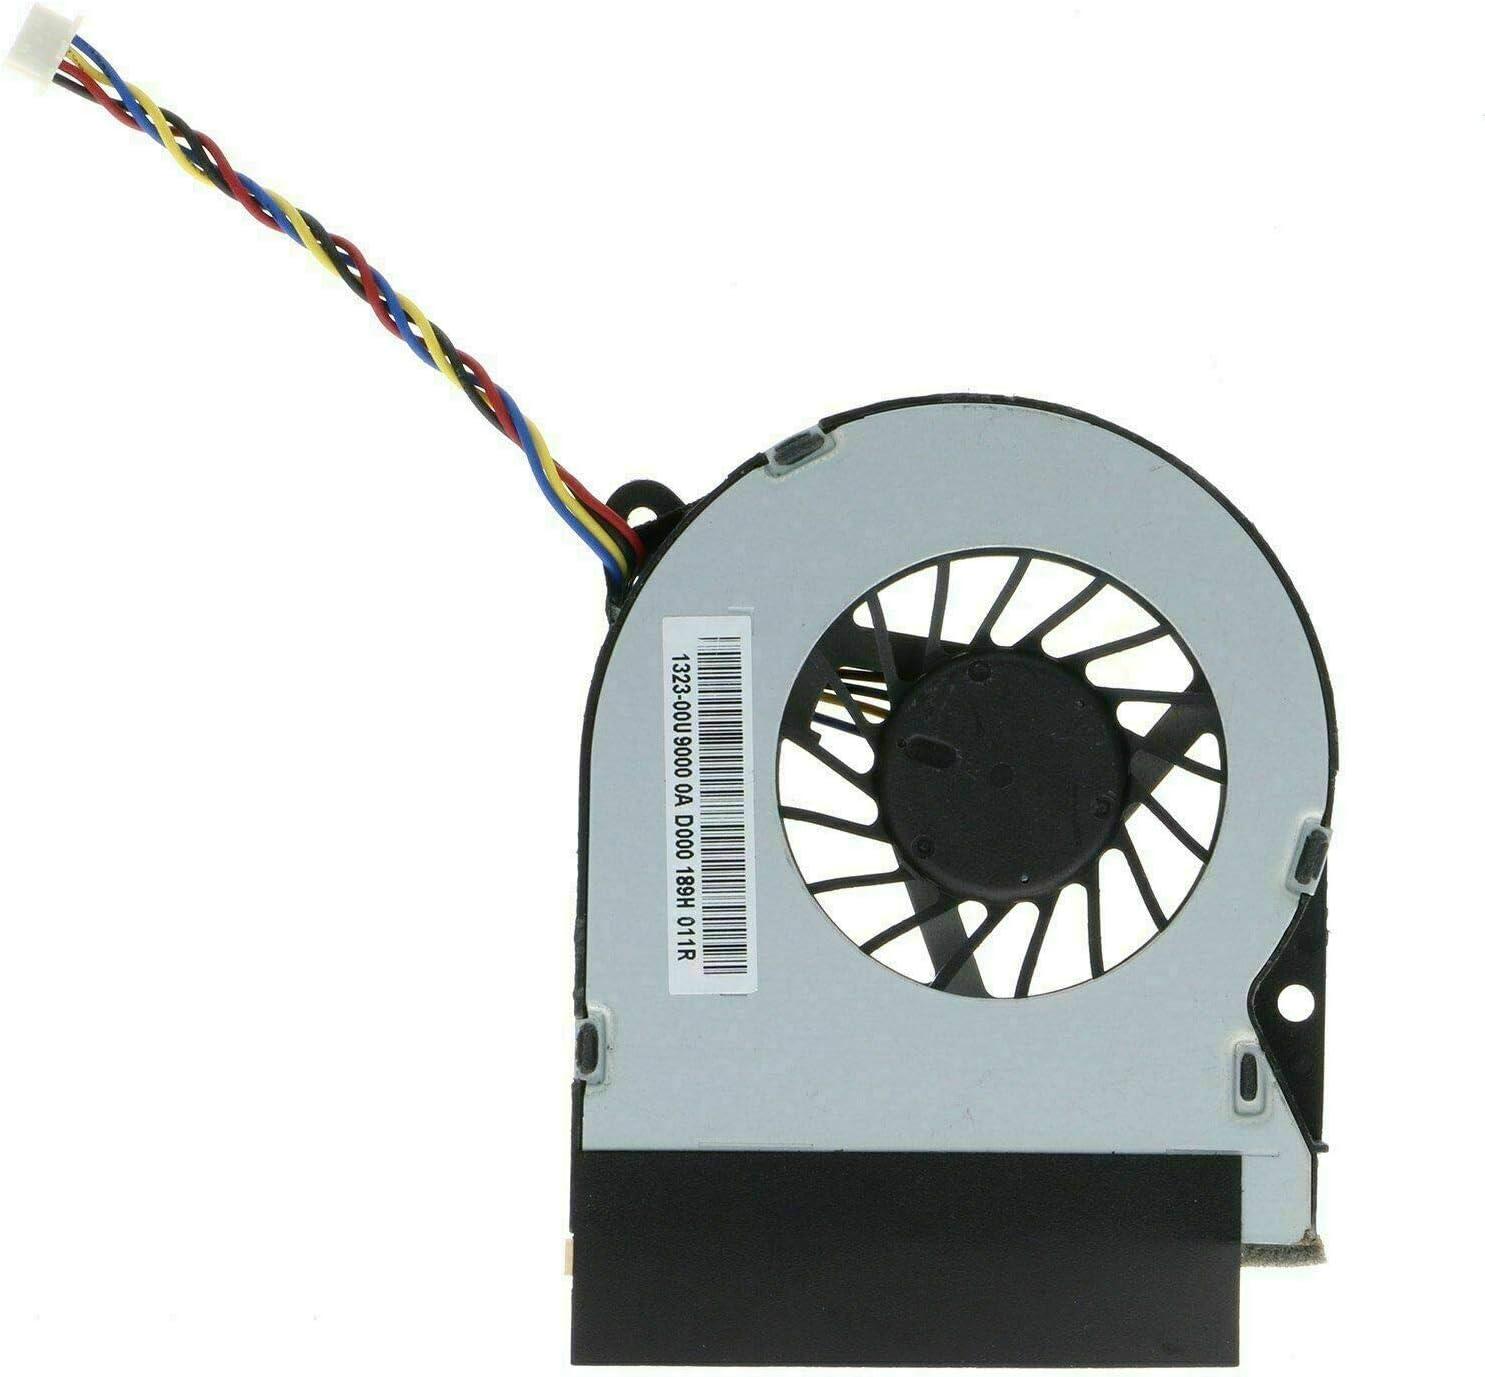 HK-Part Fan for Intel NUC Kit NUC6i7KYK KSB0605HB 1323-00U9000 CPU Cooling Fan